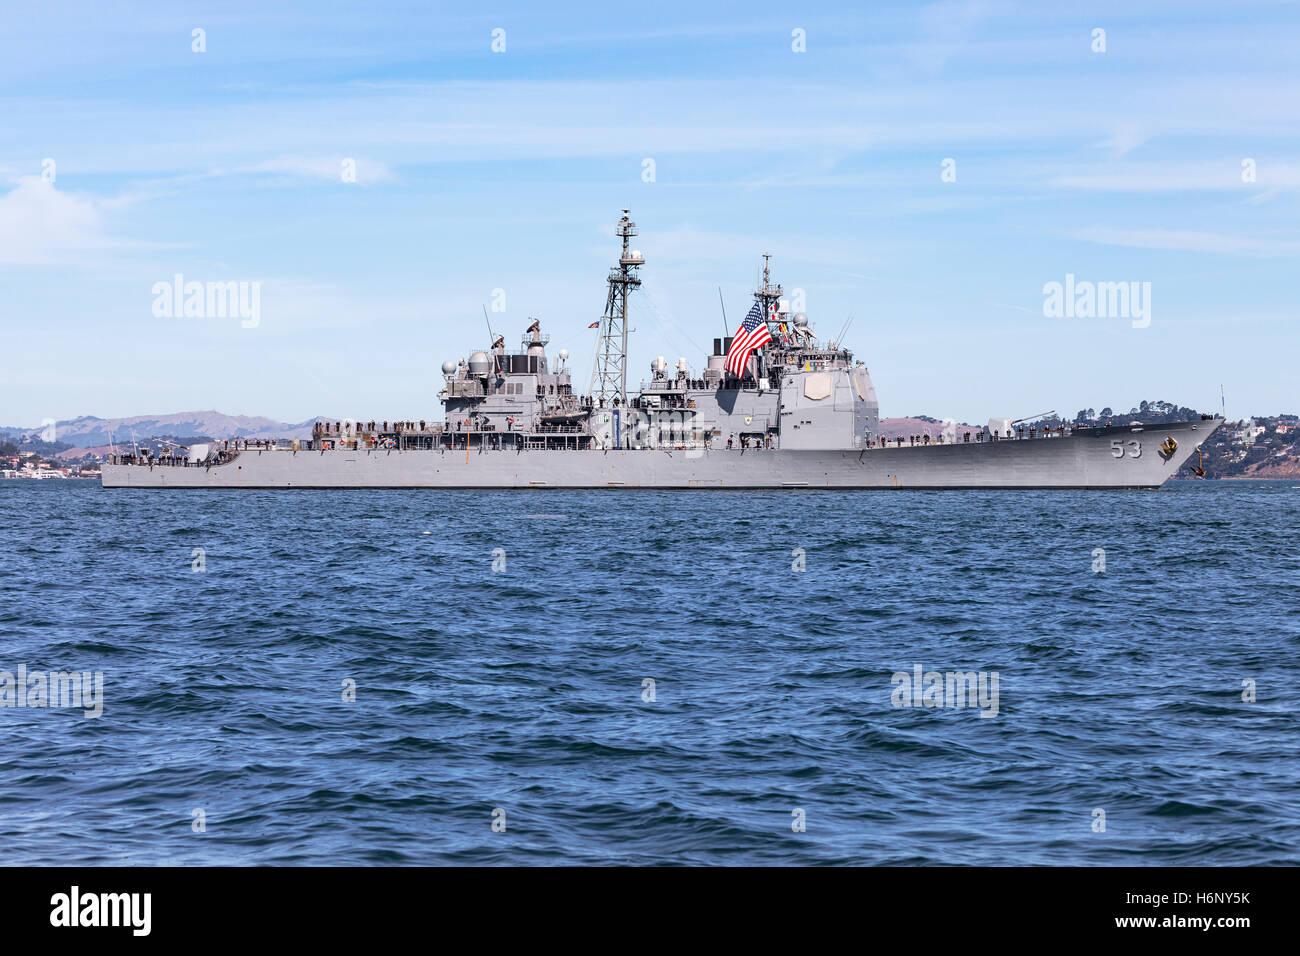 United States Navy Guided Missile Destroyer USS John Paul Jones (DDG-53) on San Francisco Bay Stock Photo